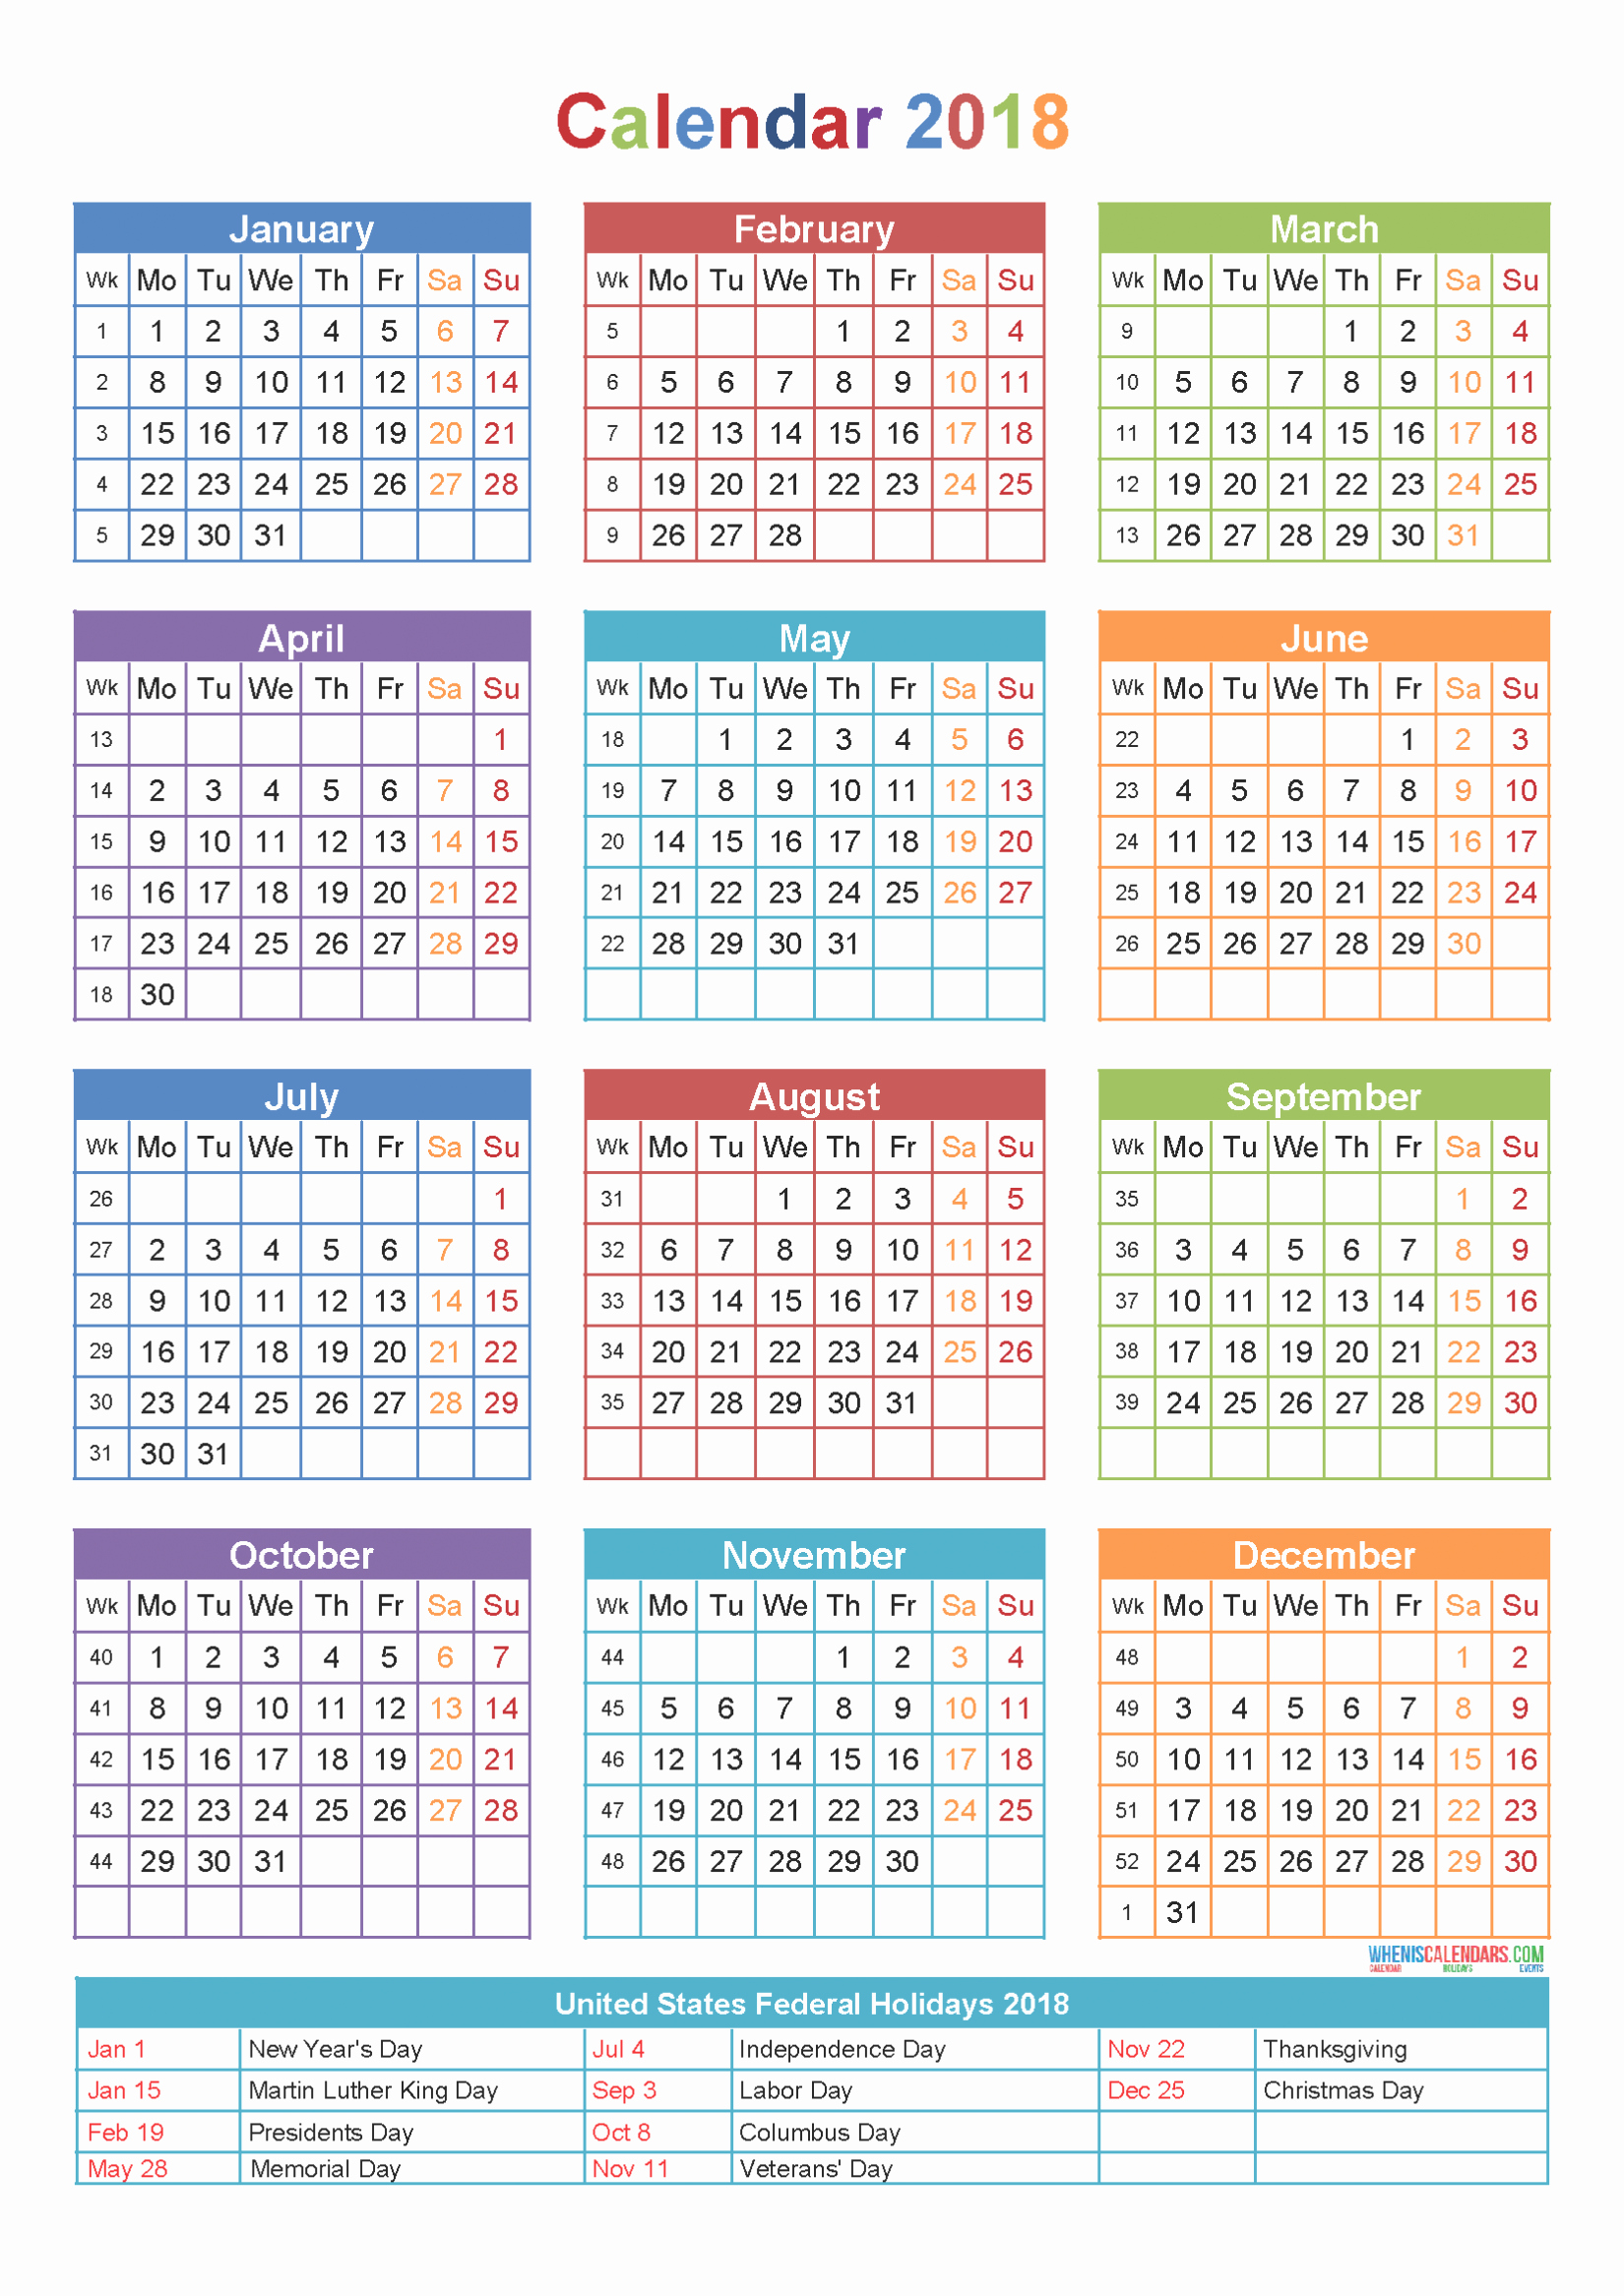 Calendar 2018 Printable with Holidays Luxury 2018 Calendar Printable with Holidays Excel Word Usa